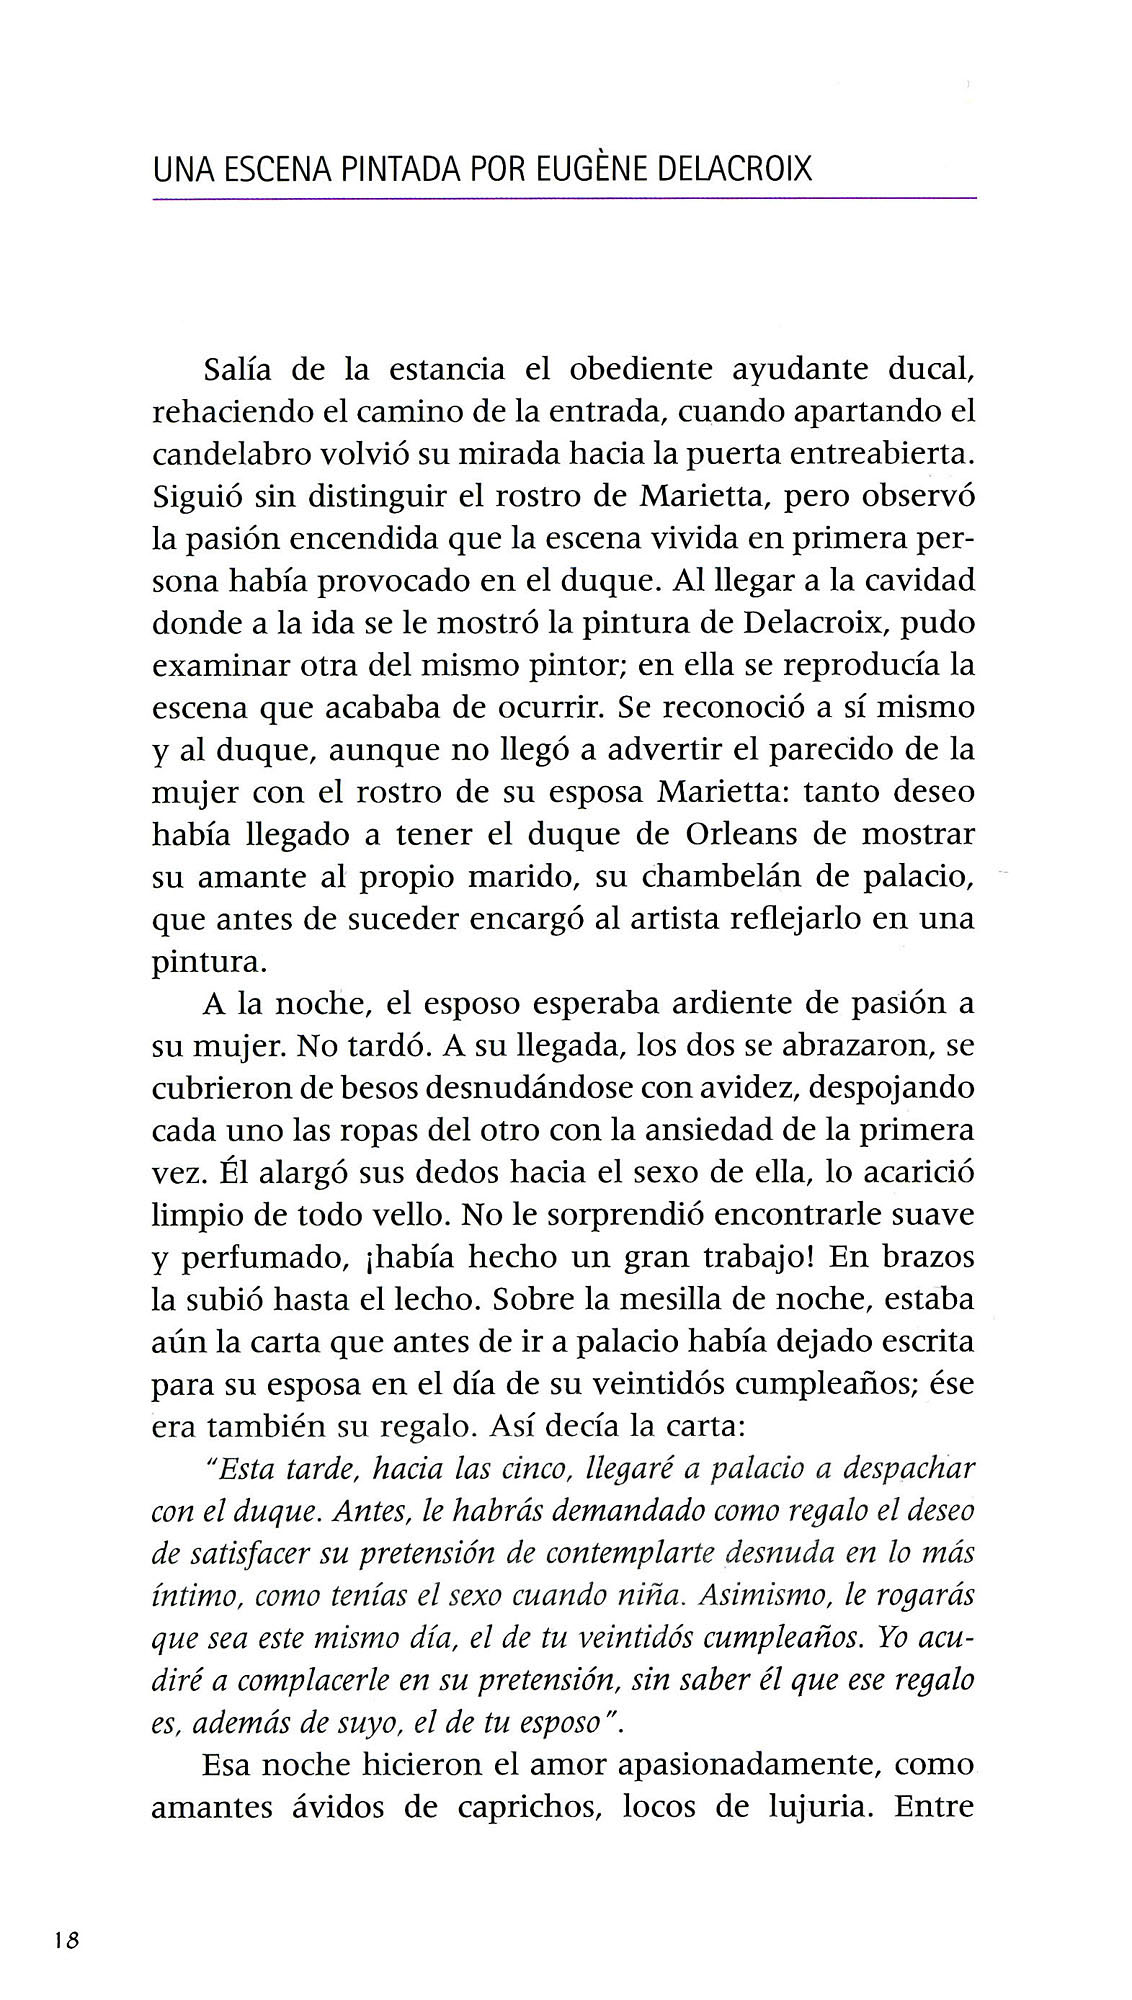 danielvillalobos-calderonsamaniego-story-storyerotic-spanishliterature-12